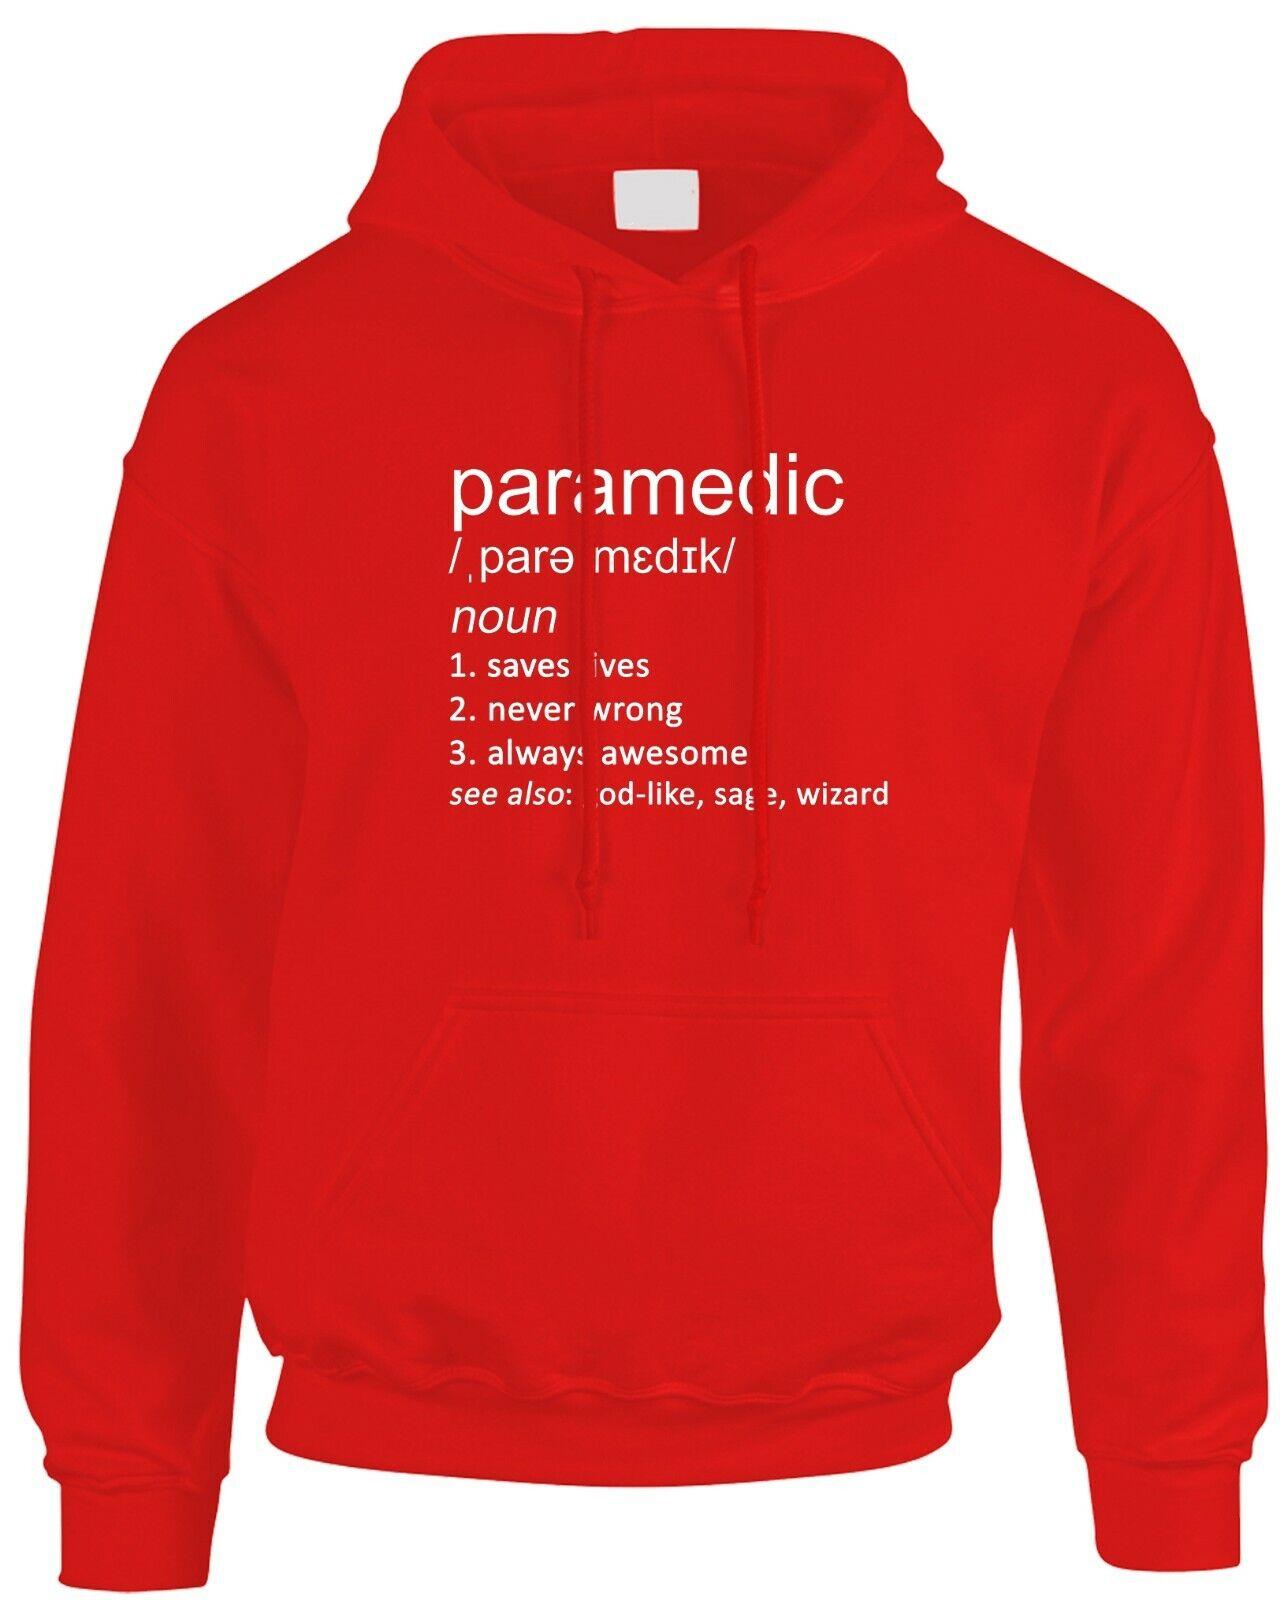 Paramedic Funny Definition Men's Mens Hoody Gift Idea Medic Ambulance Job Work